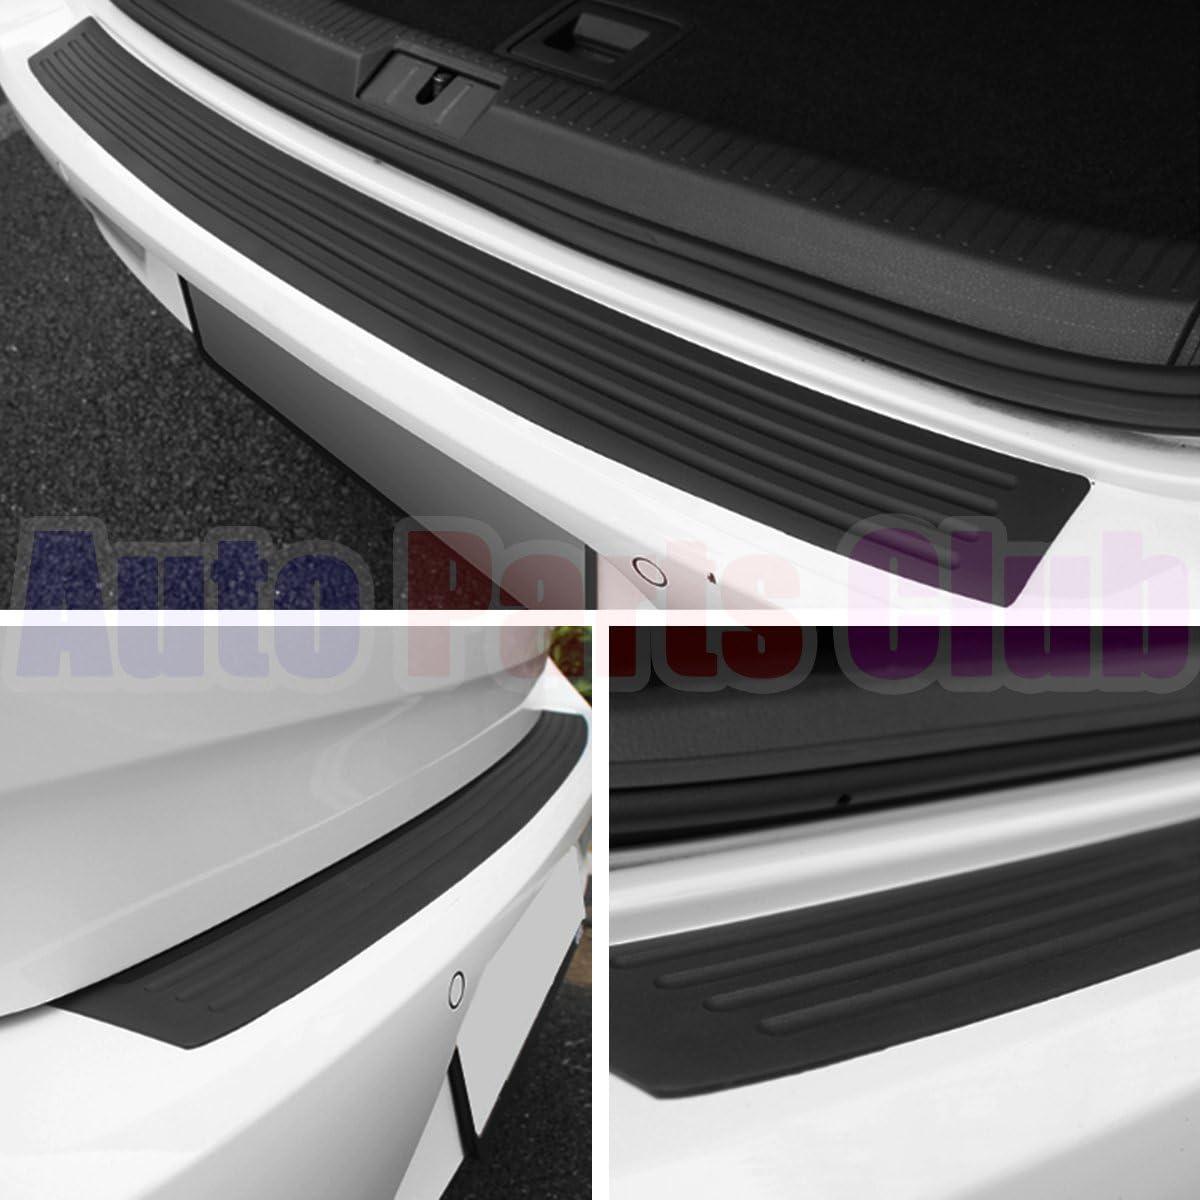 Black Car Rear Bumper Guard Protector Exterior Decoration Scratch Protection